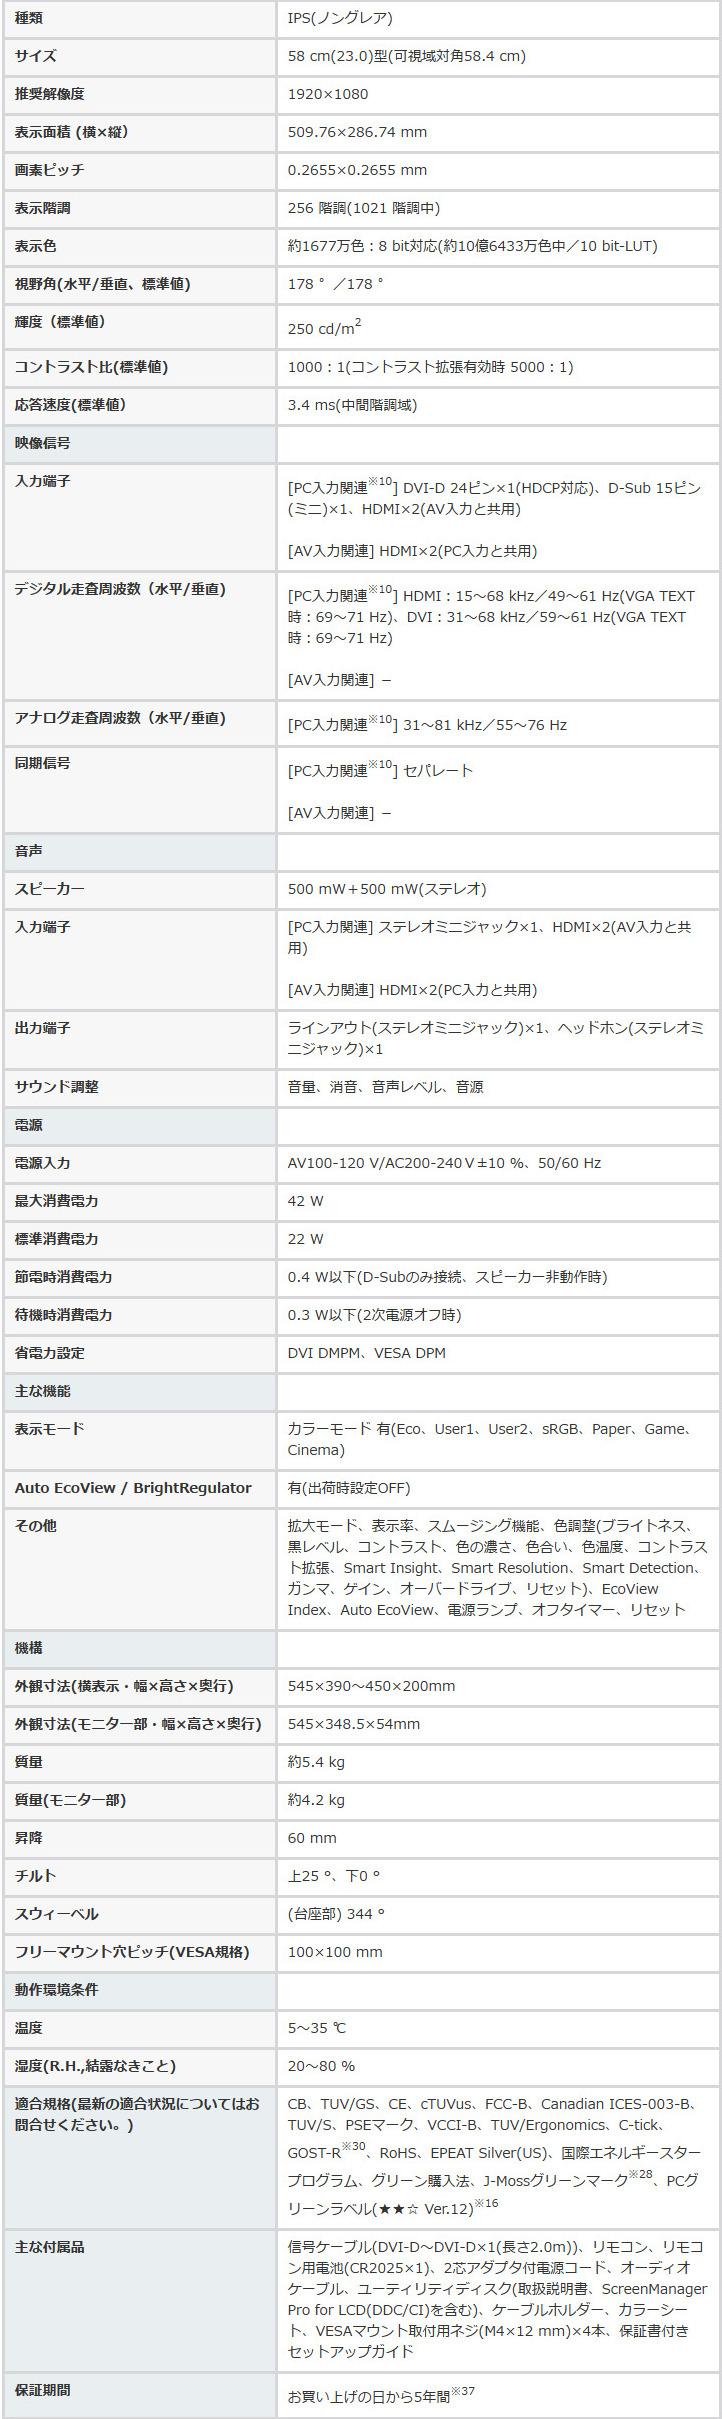 FORIS FS2333 EIZO株式会社(2)